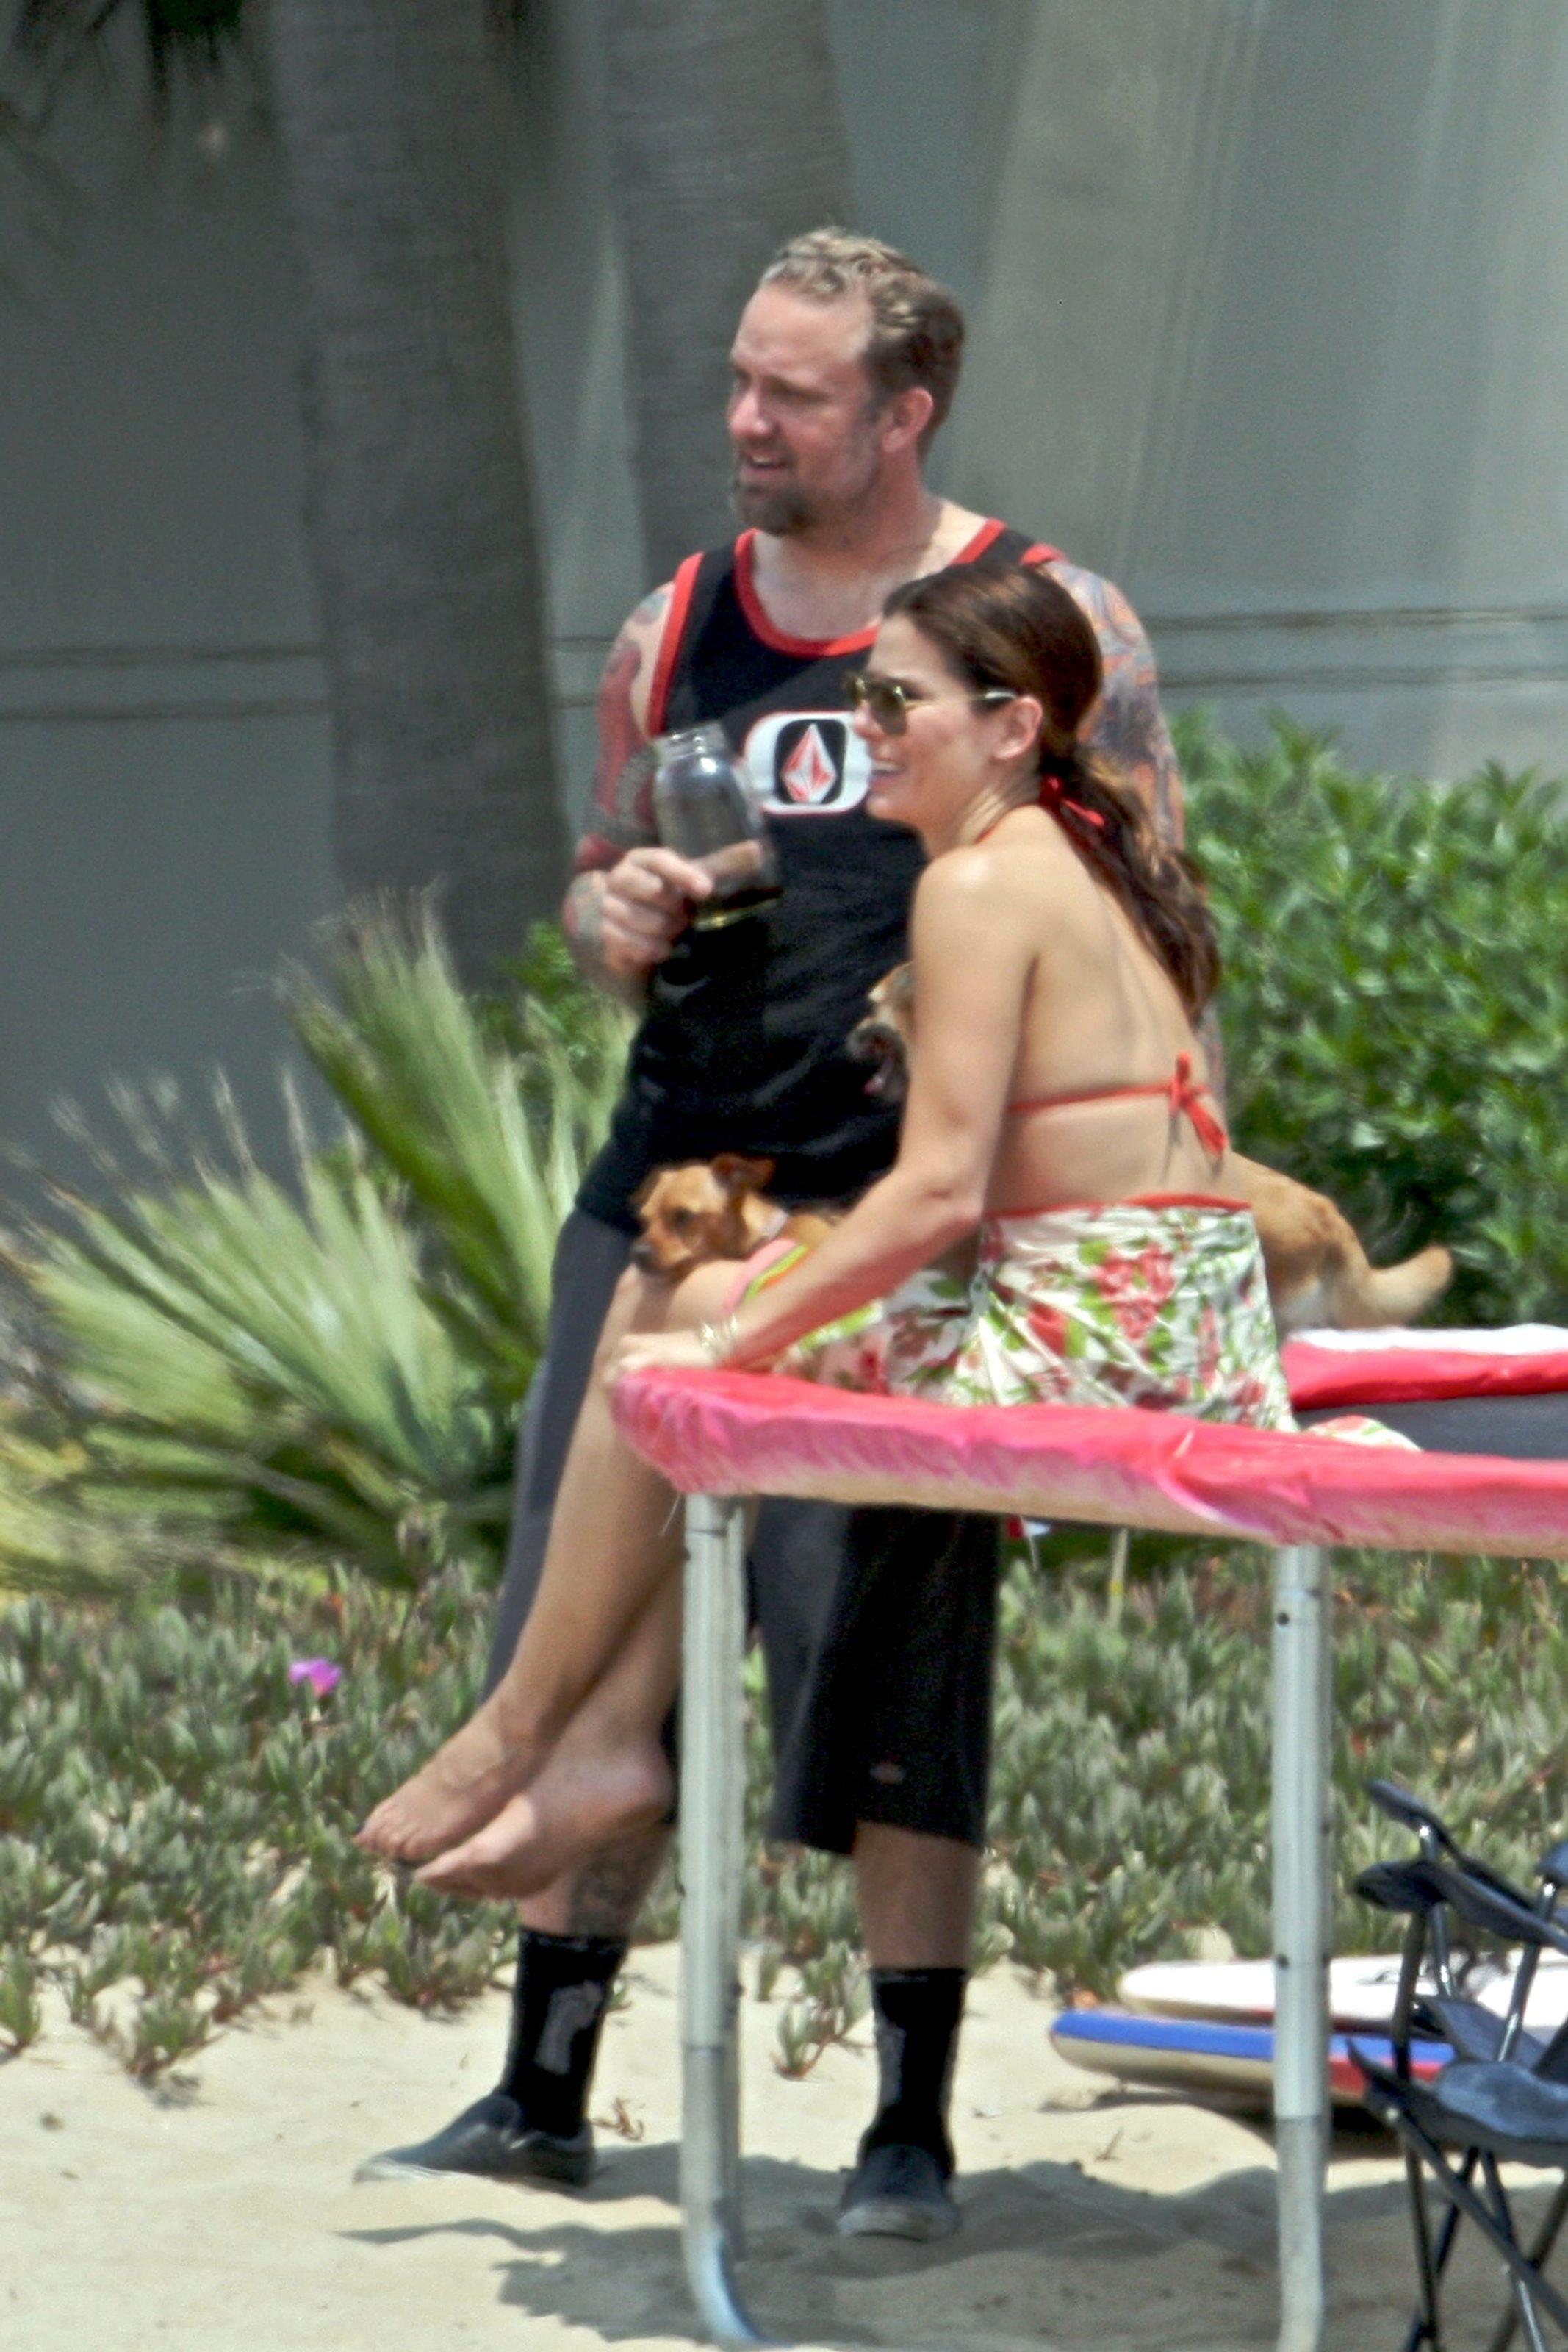 79523_Celebutopia-Sandra_Bullock_in_top_bikini_and_husband_host_an_Independence_Day_beach_party-08_122_691lo.jpg